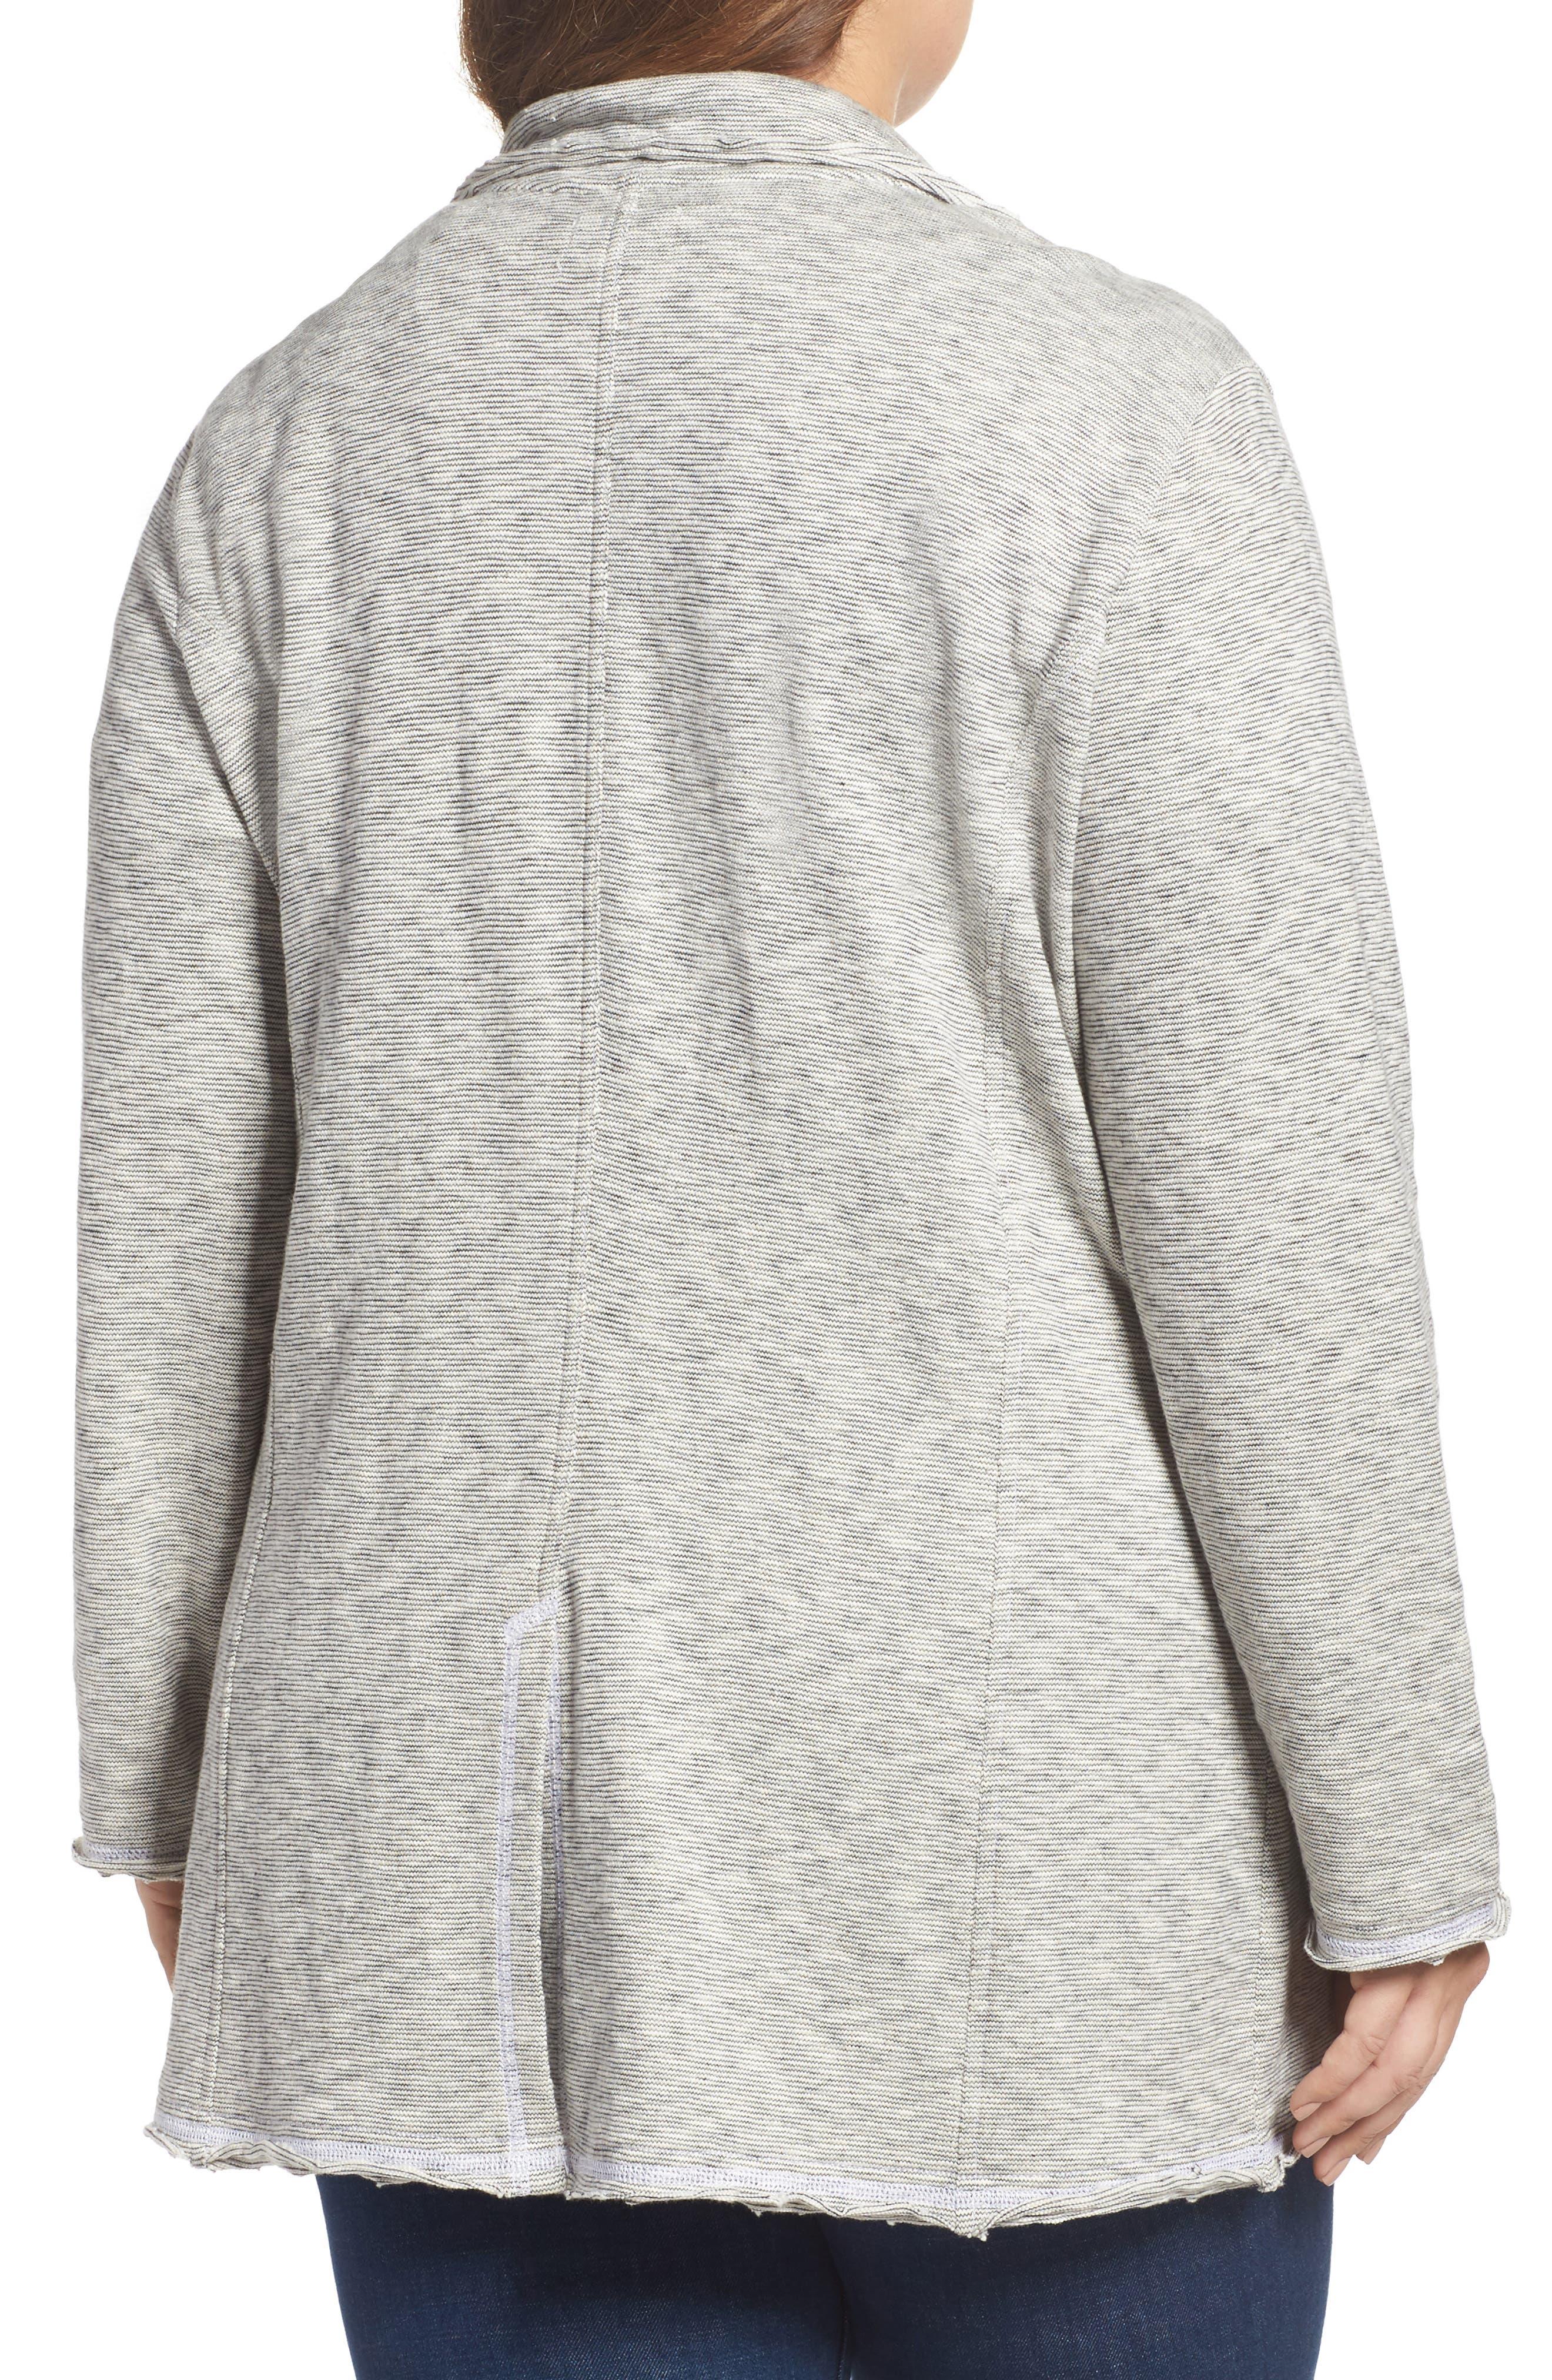 Knit Boyfriend Blazer,                             Alternate thumbnail 2, color,                             Black- Ivory Pattern